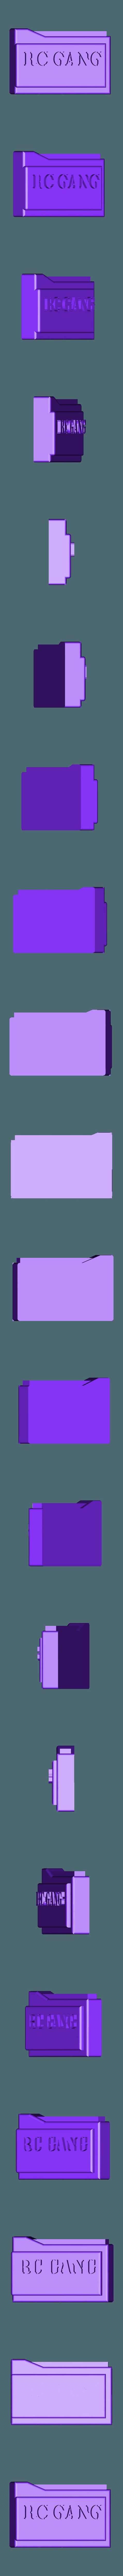 calcu.stl Download free STL file elements engine compartments rc scale 1/10 • 3D printer design, RCGANG93